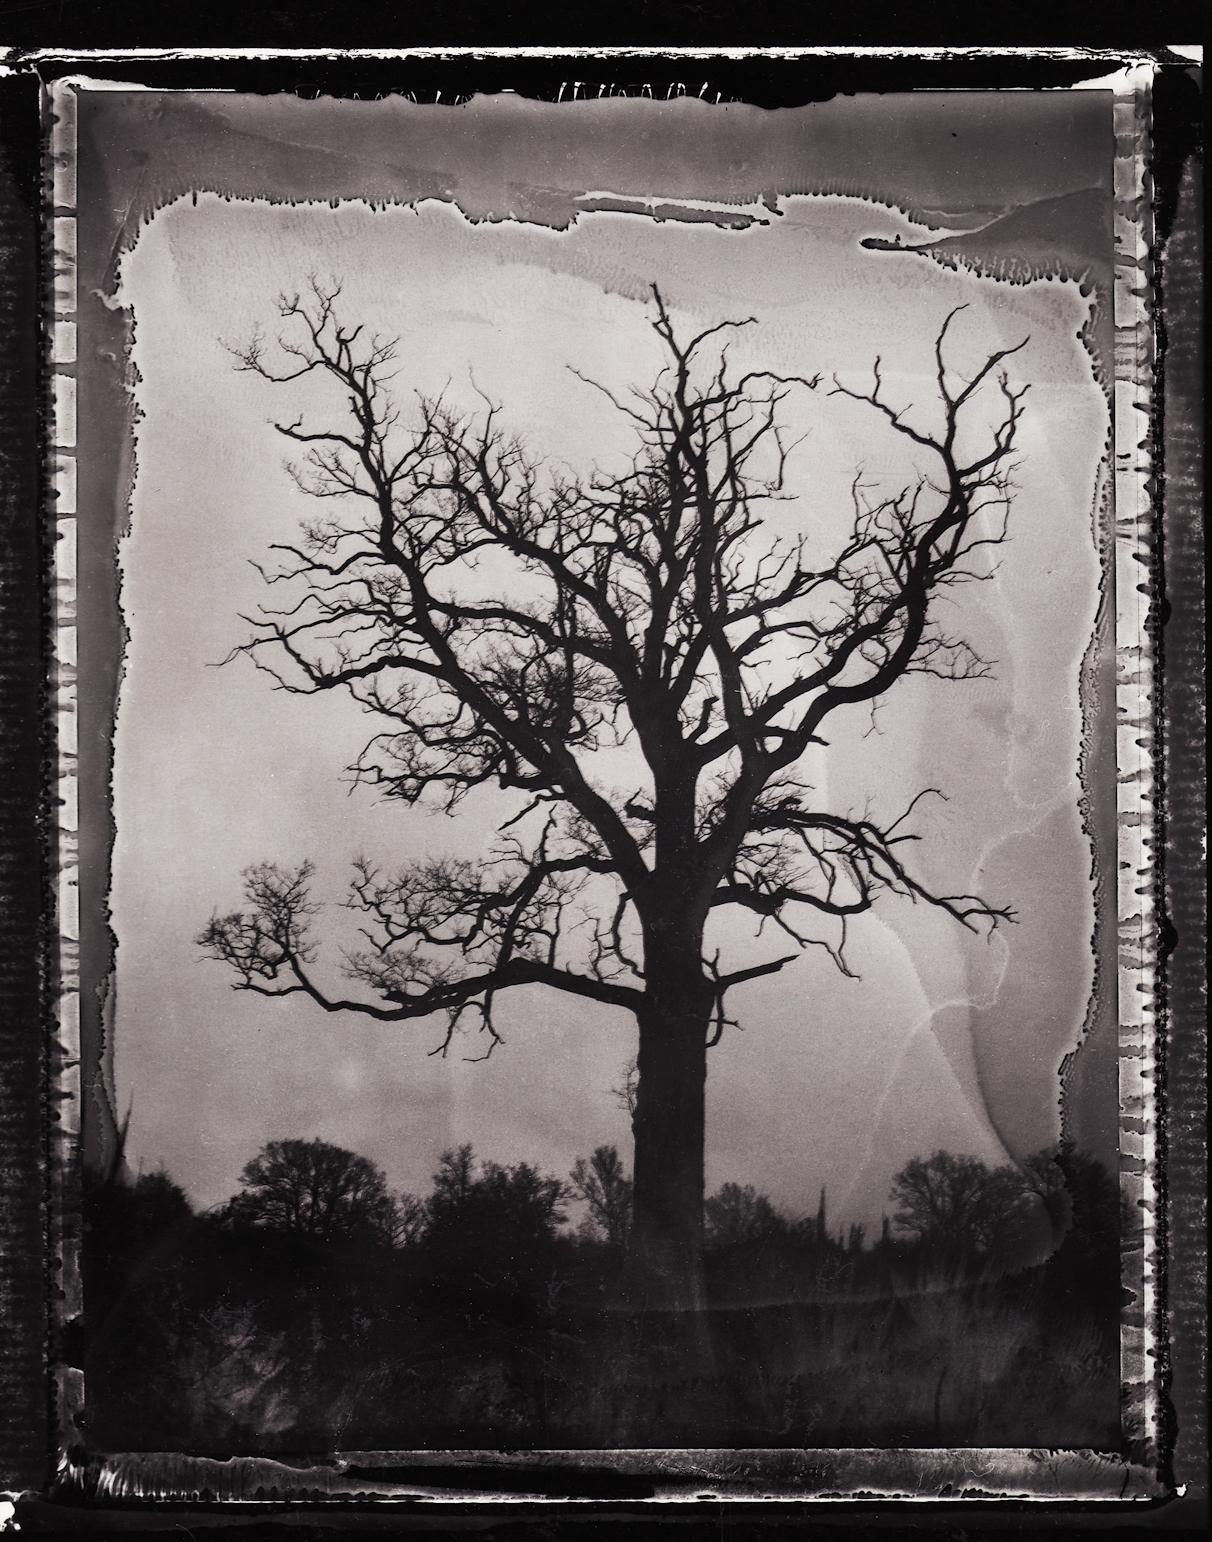 Pola-arbre 9.jpg